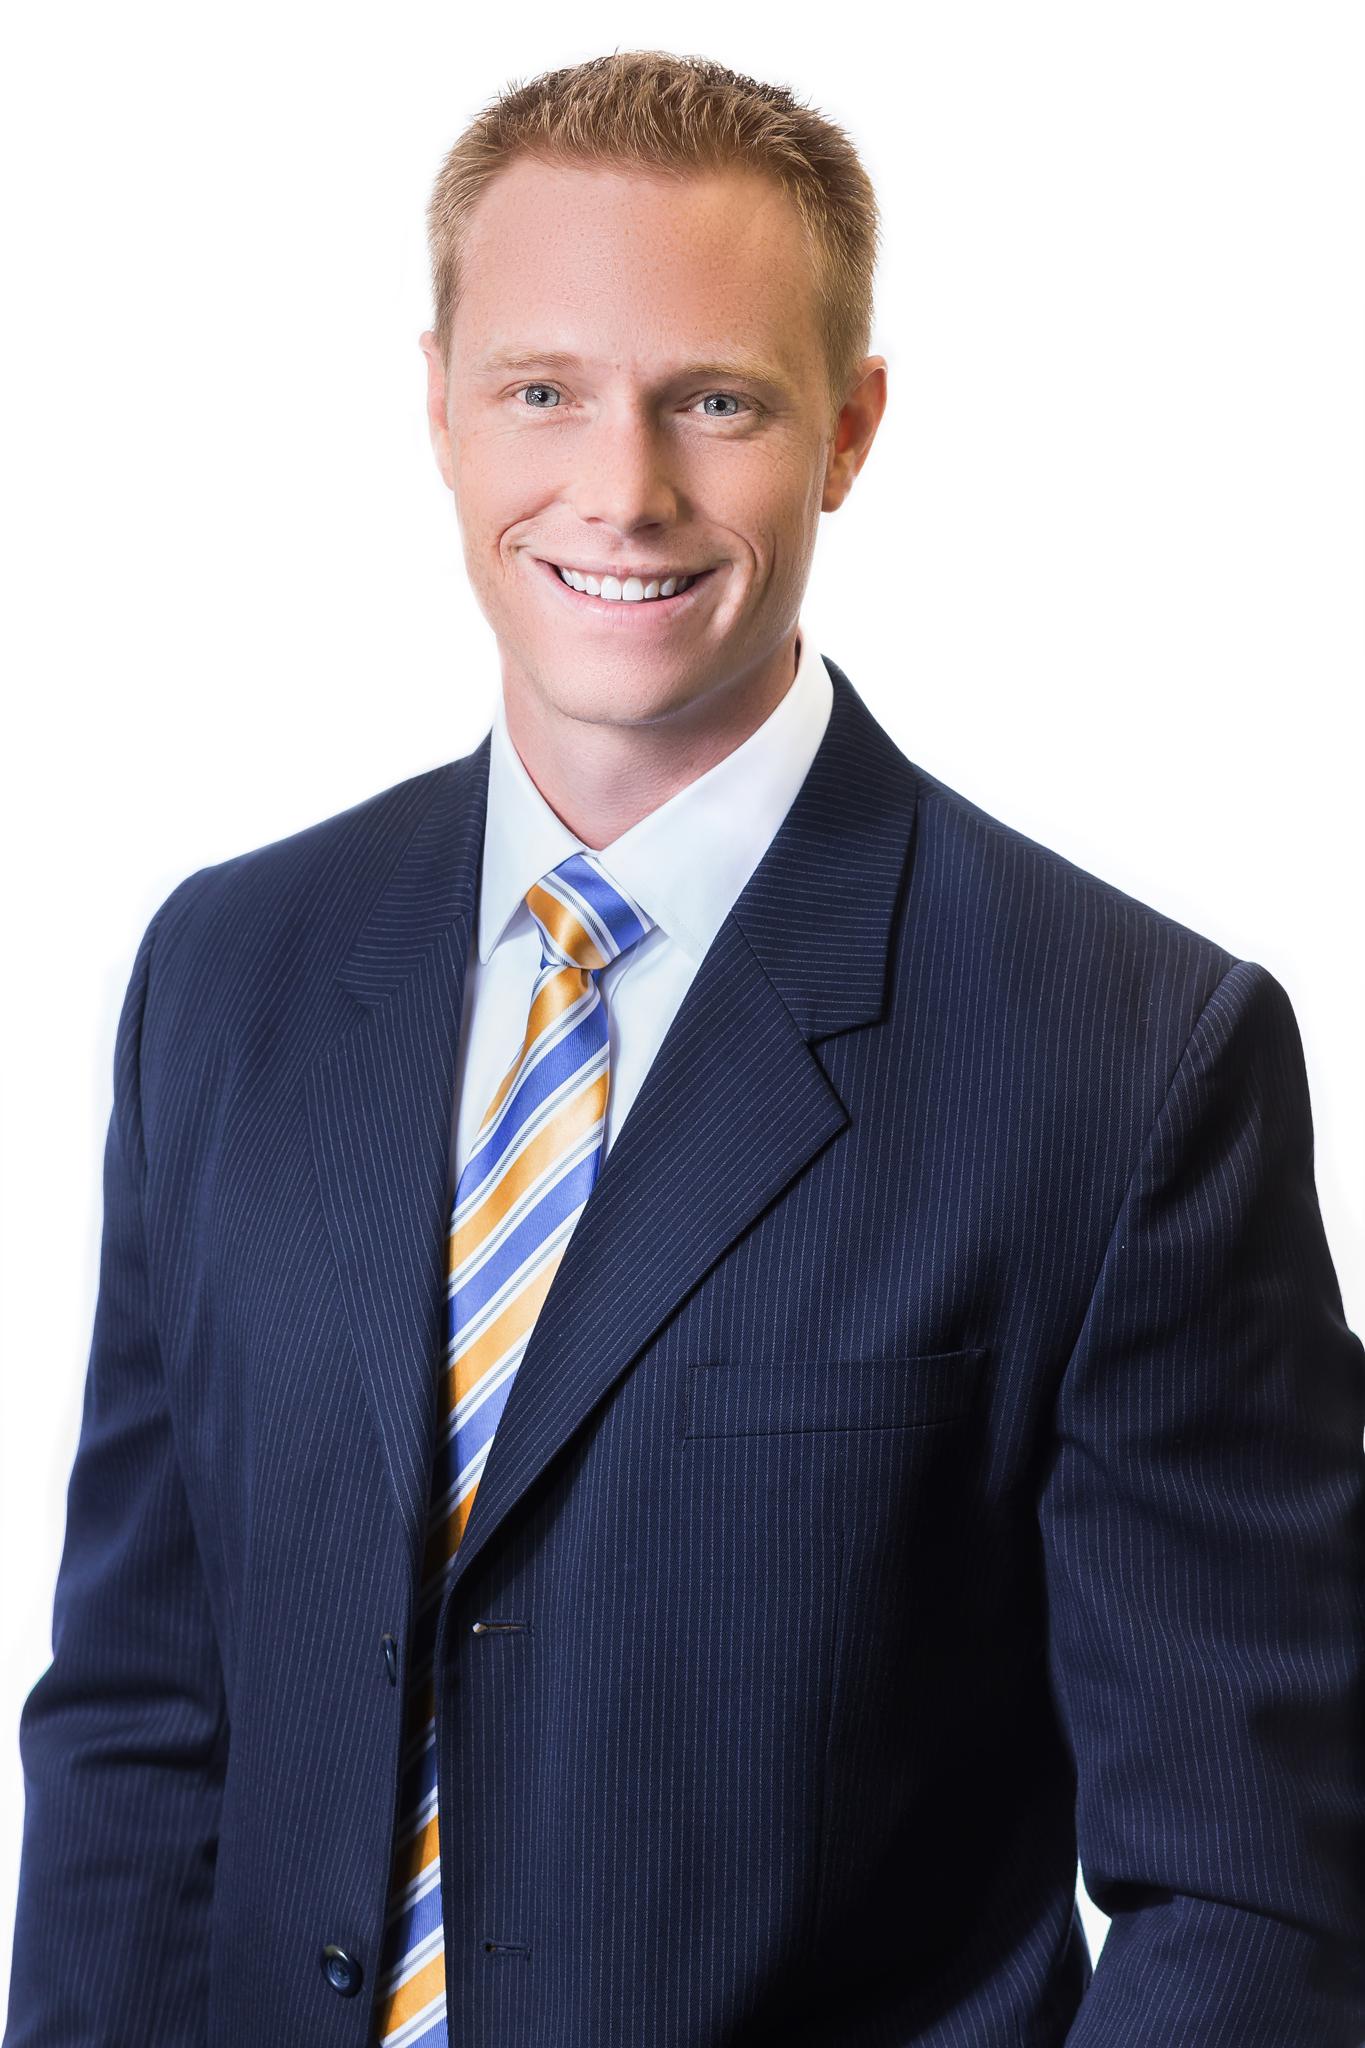 Matt Porter - Professional Headshot | Tempe, AZ